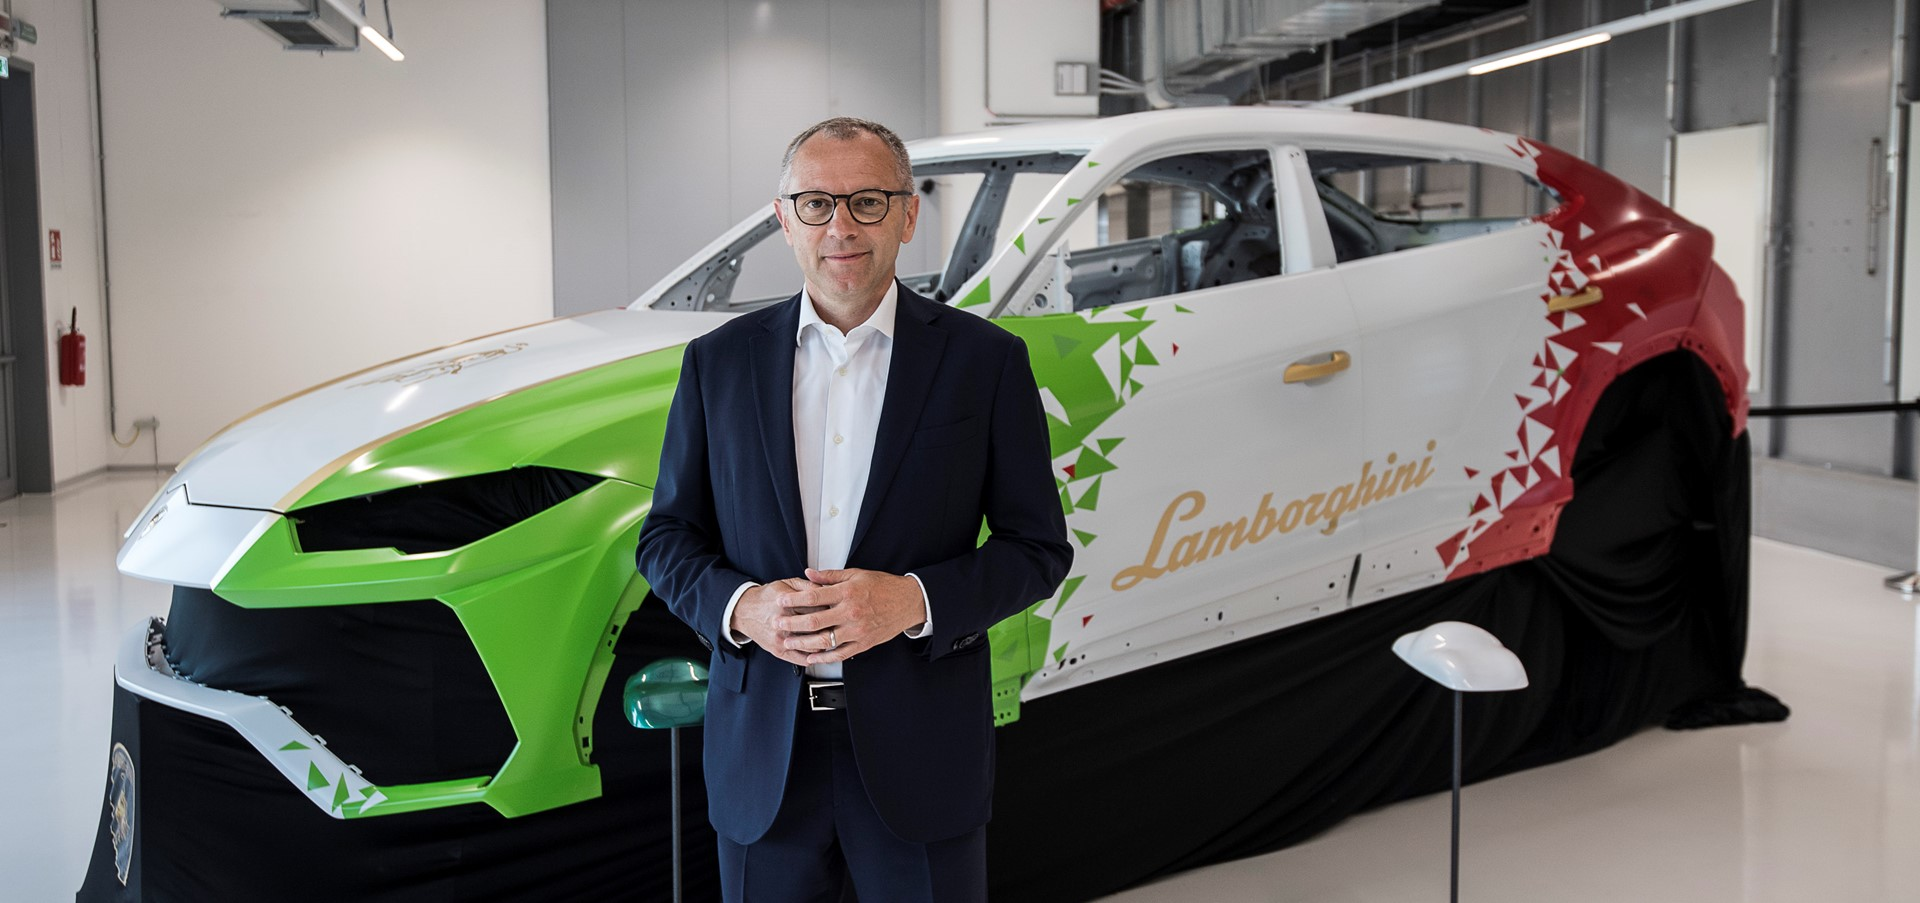 Automobili Lamborghini intensifies measures taken against..